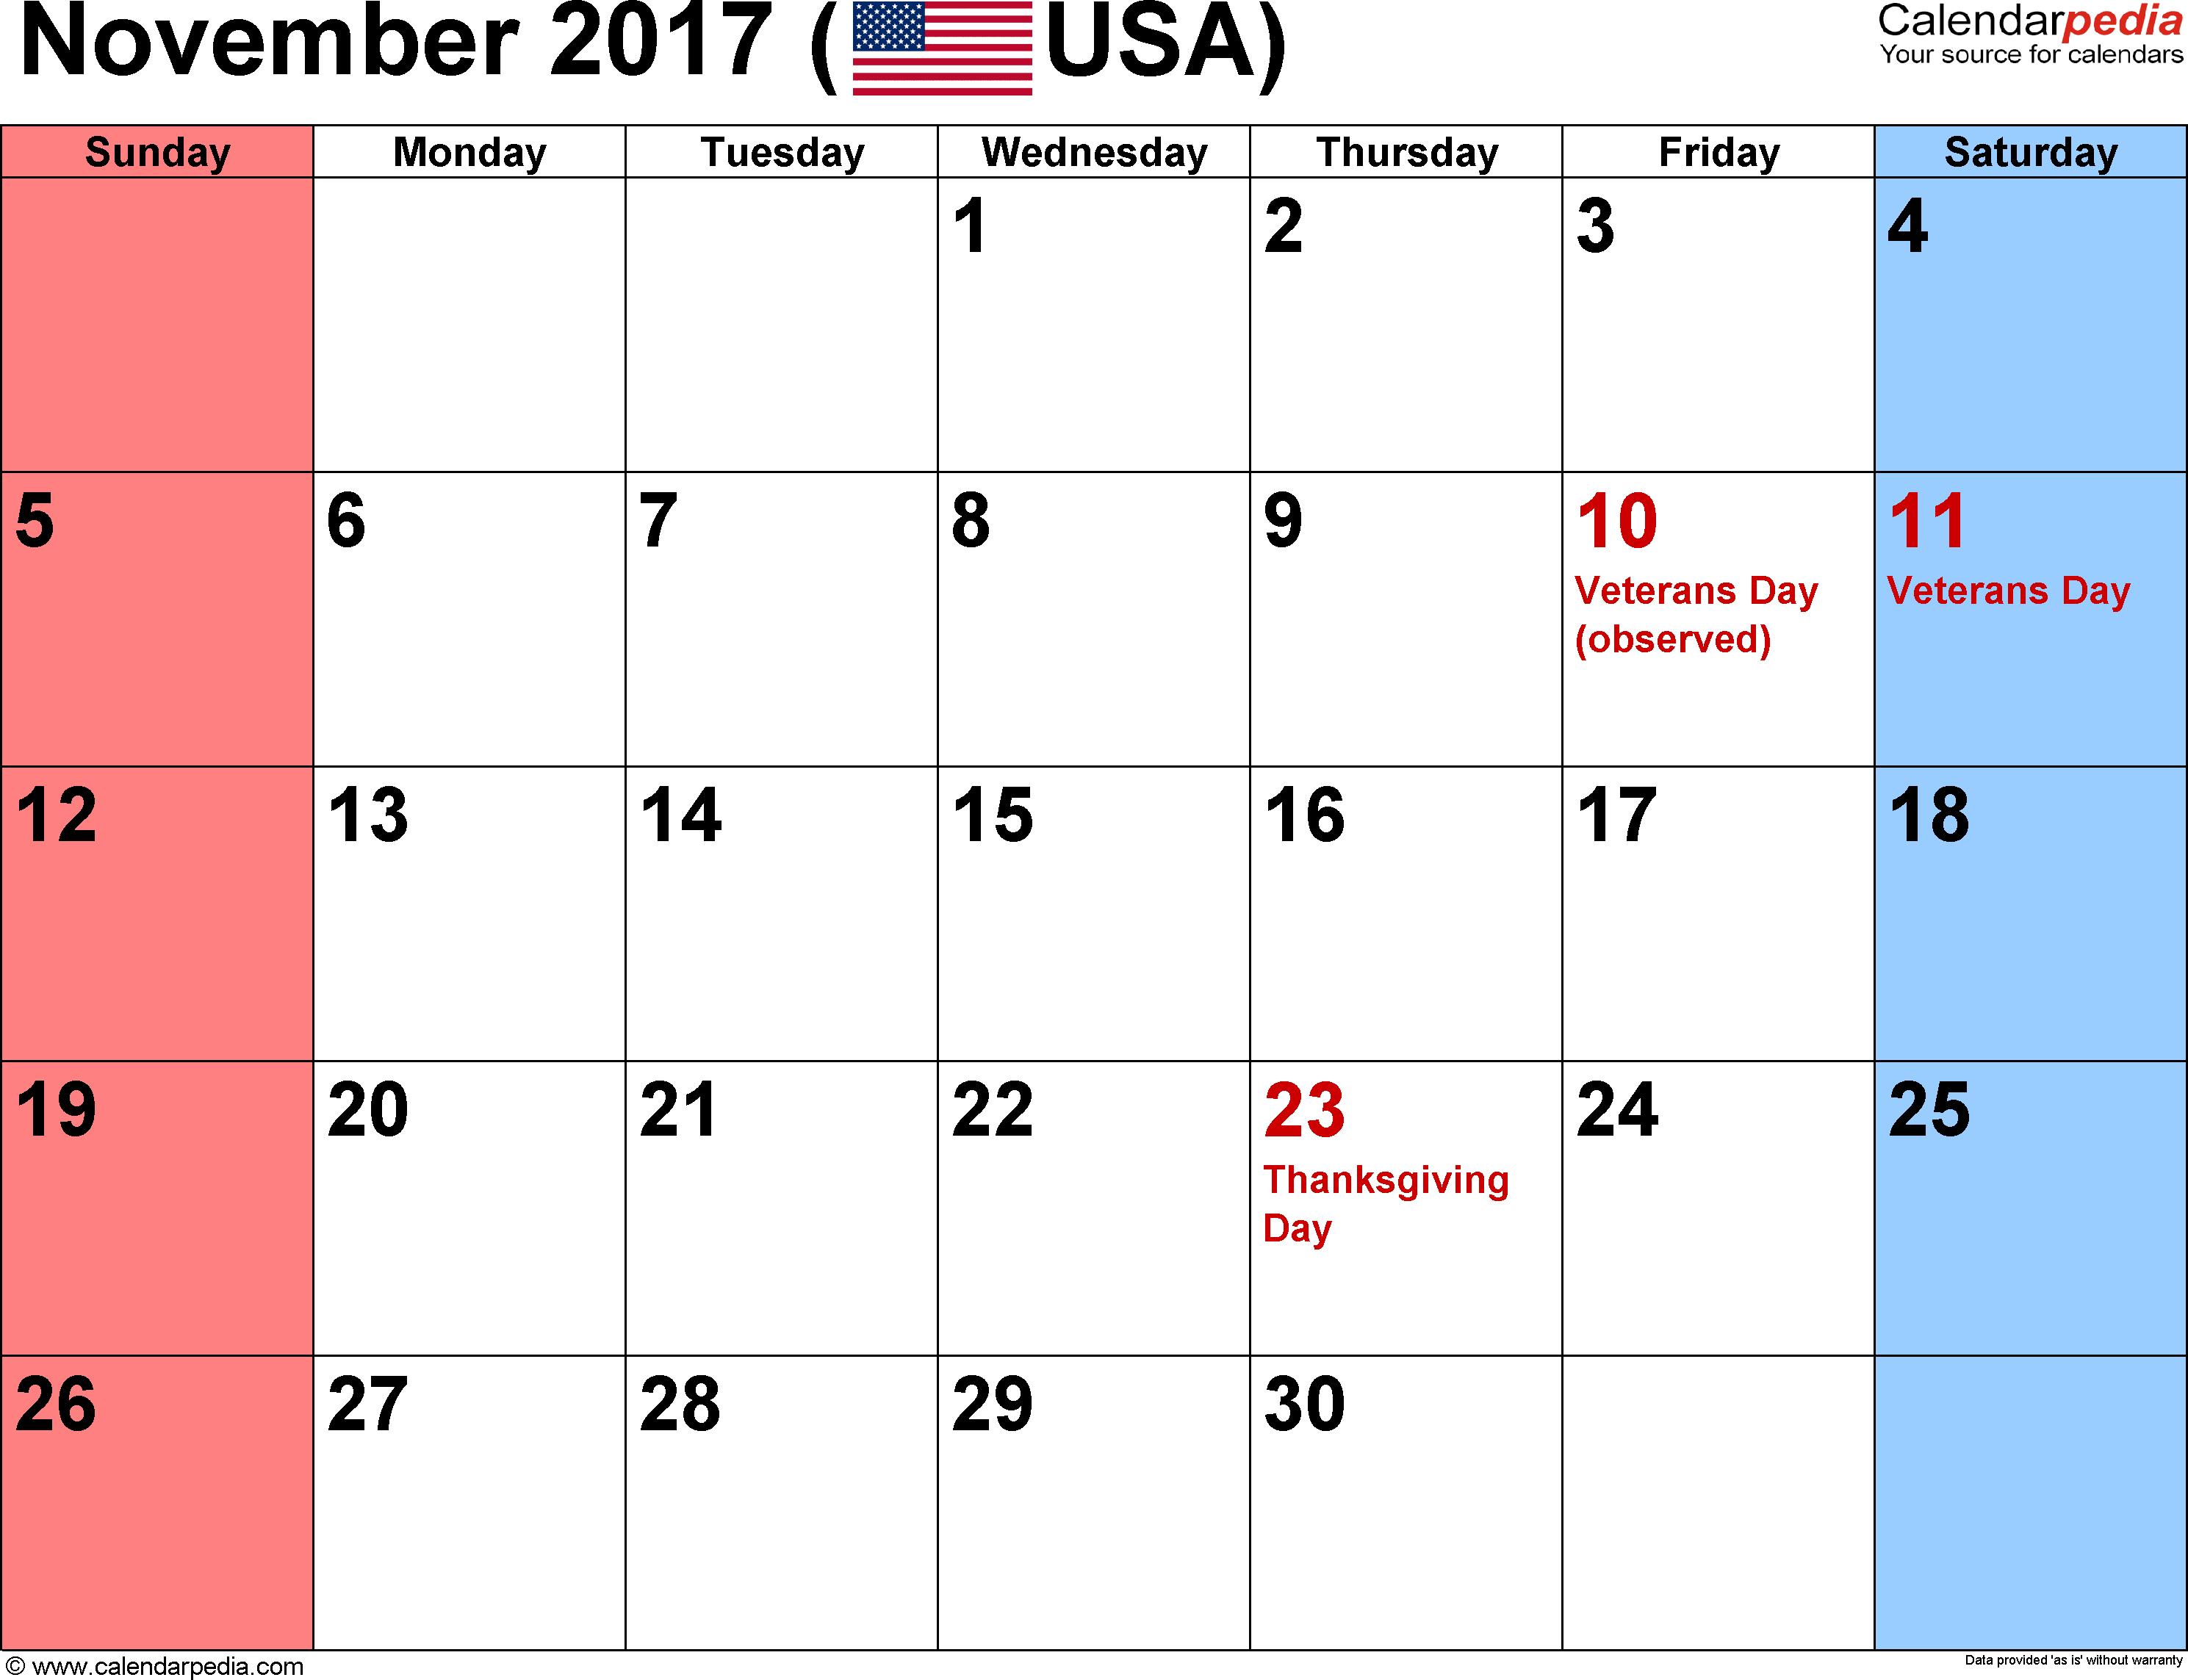 November 2017 Calendars For Word, Excel & Pdf for Holidays Calendar Templates November